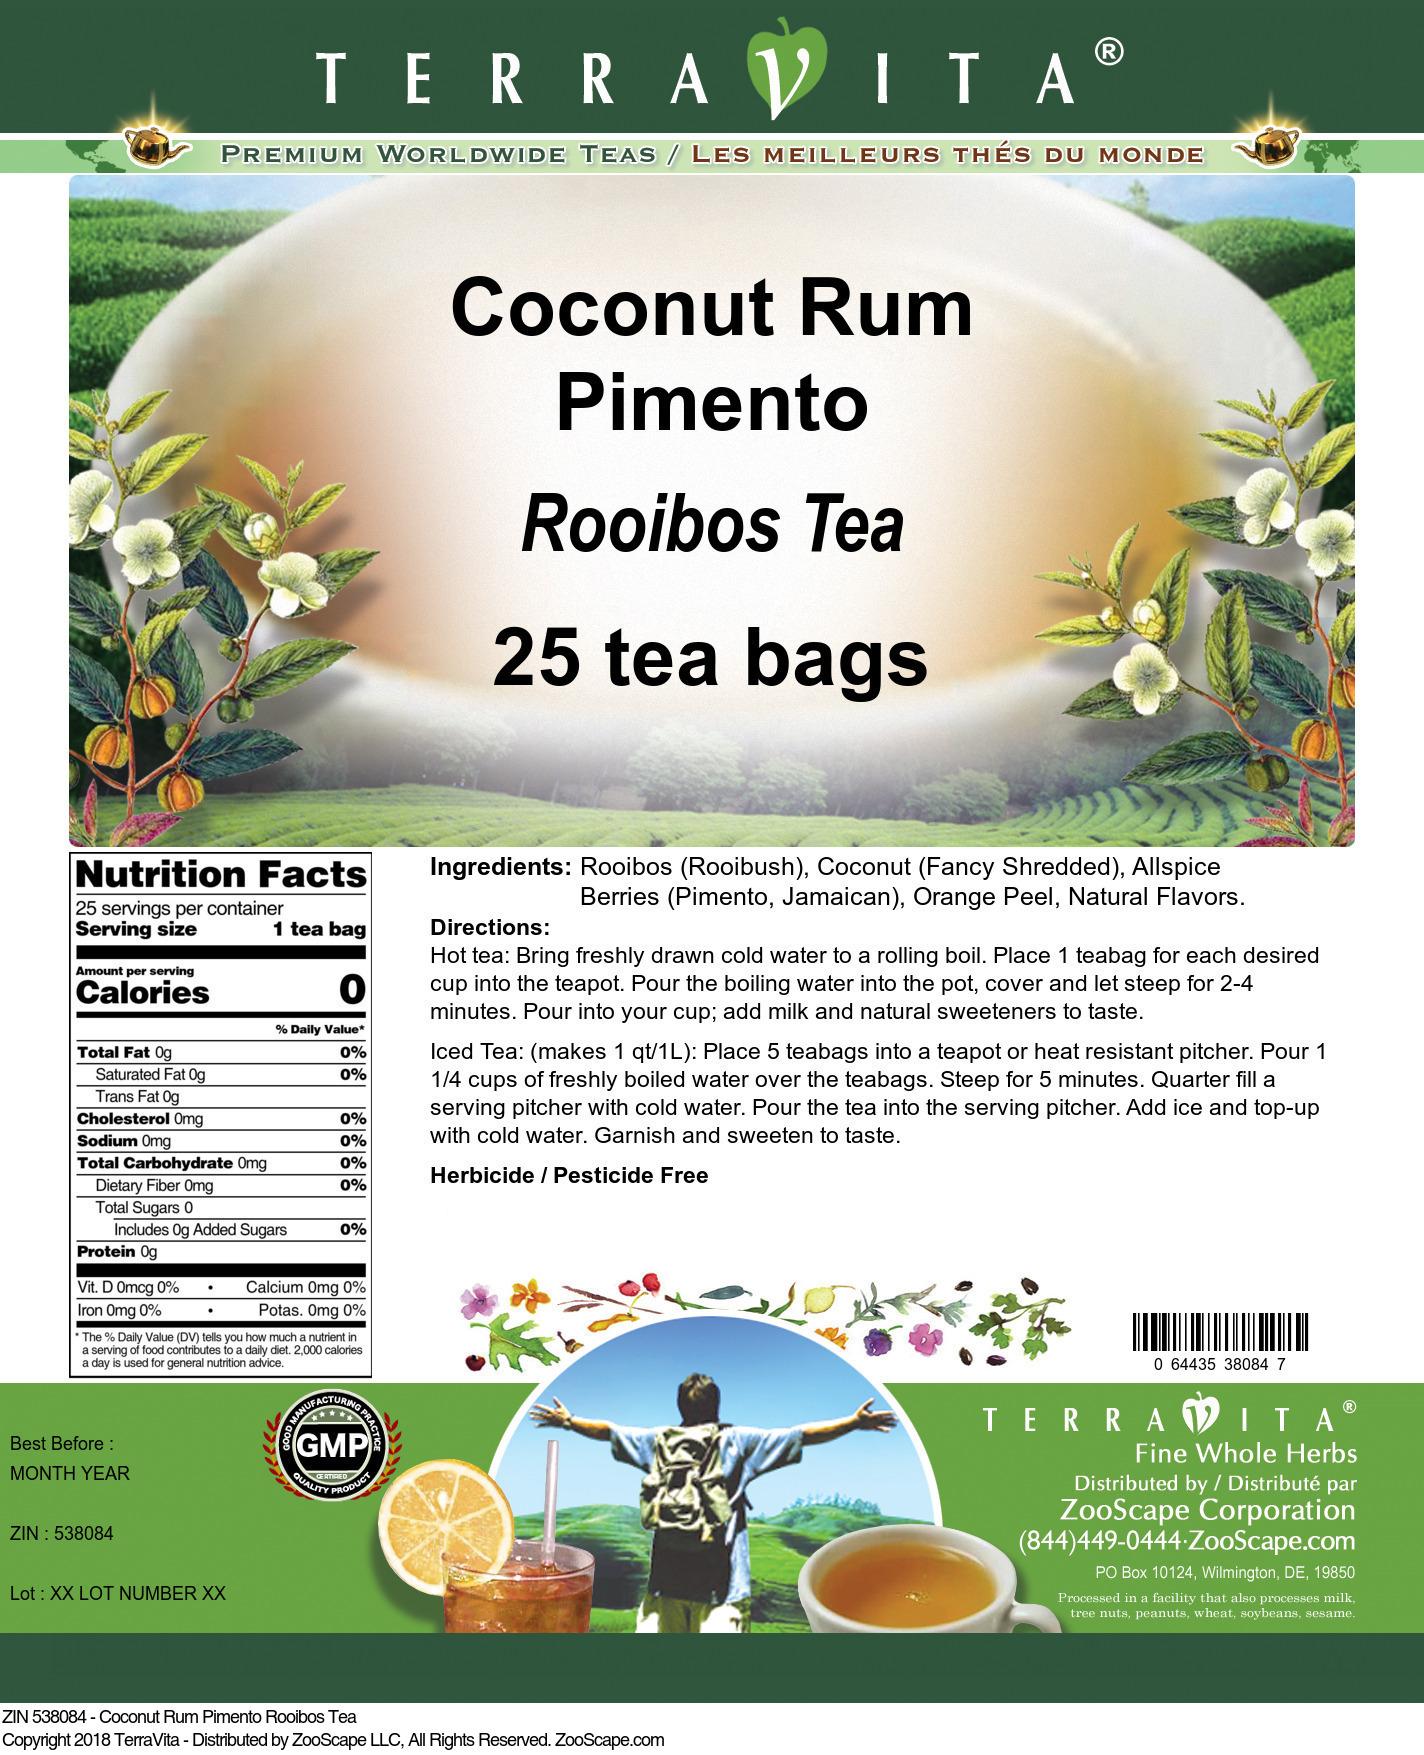 Coconut Rum Pimento Rooibos Tea